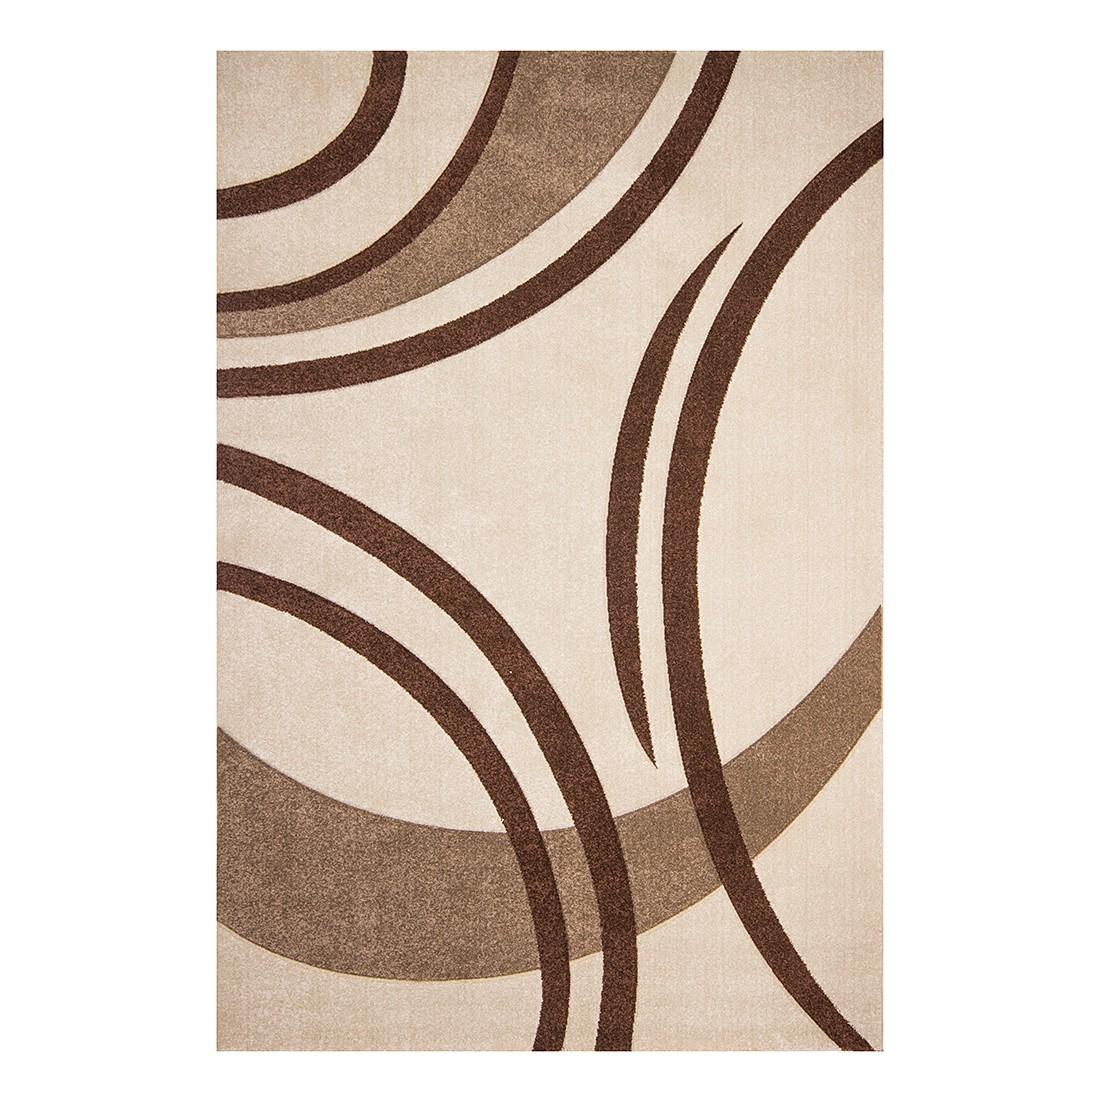 Havanna 409 - Beige - 100% Polypropylen - 200 x 290 cm, Kayoom